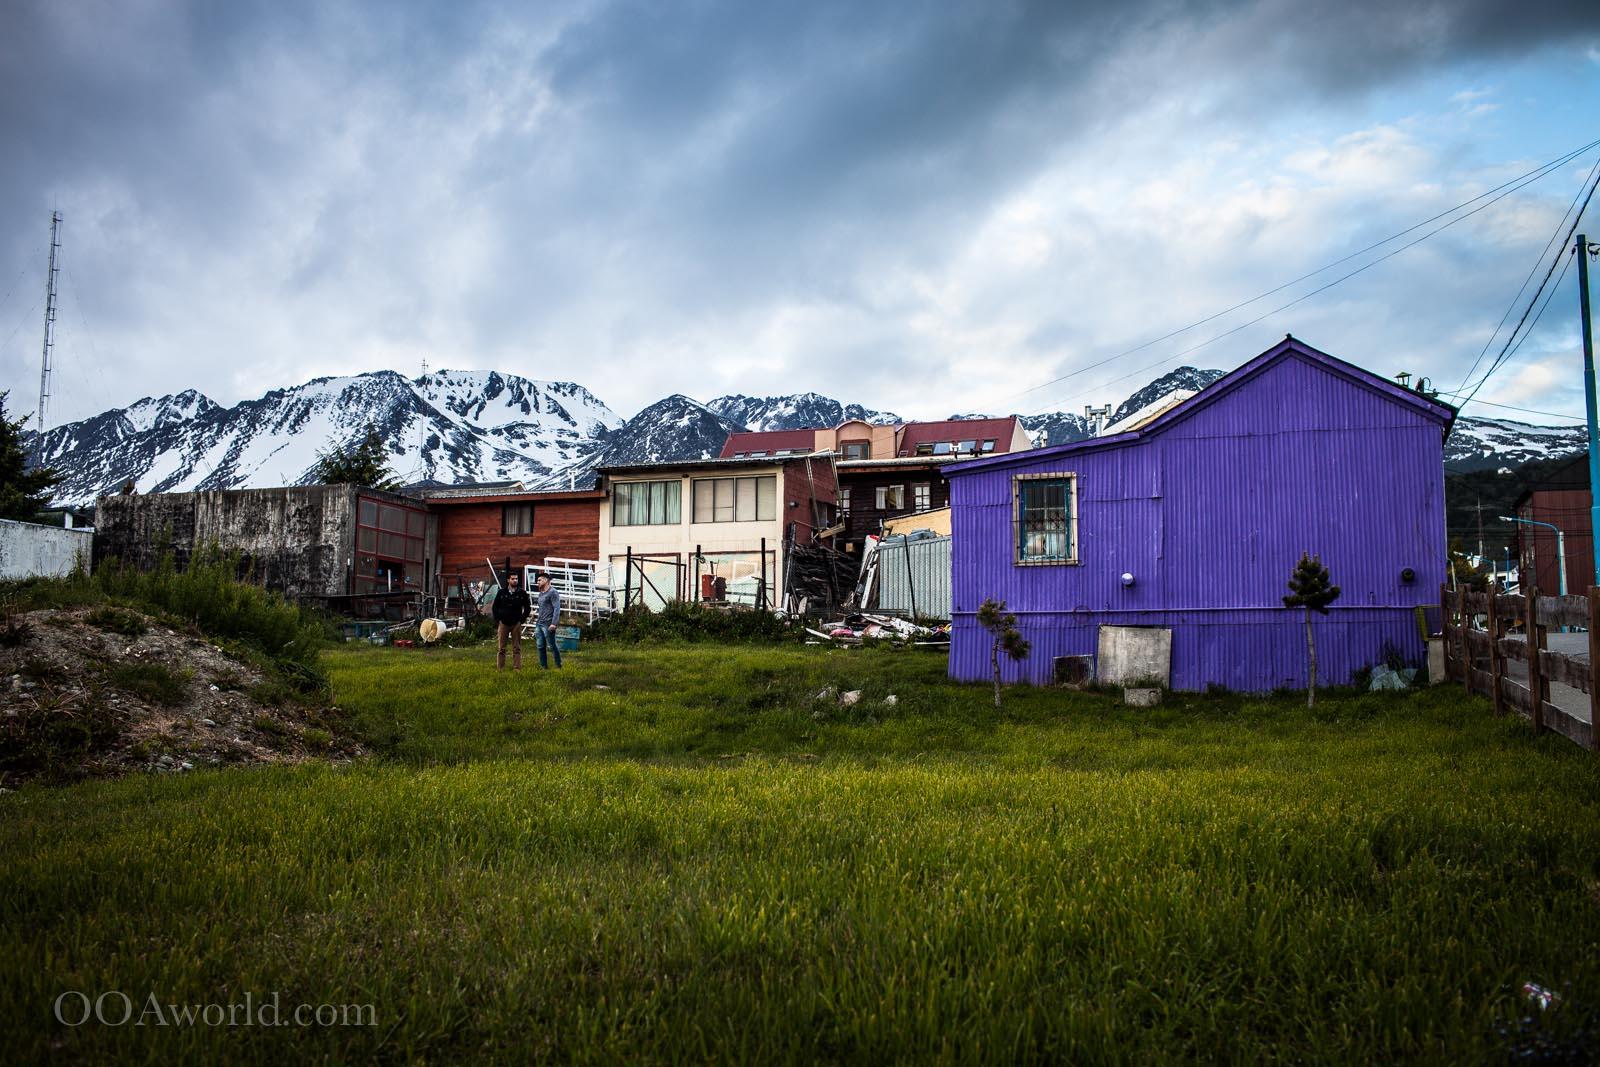 Ushuaia Houses Photo Ooaworld